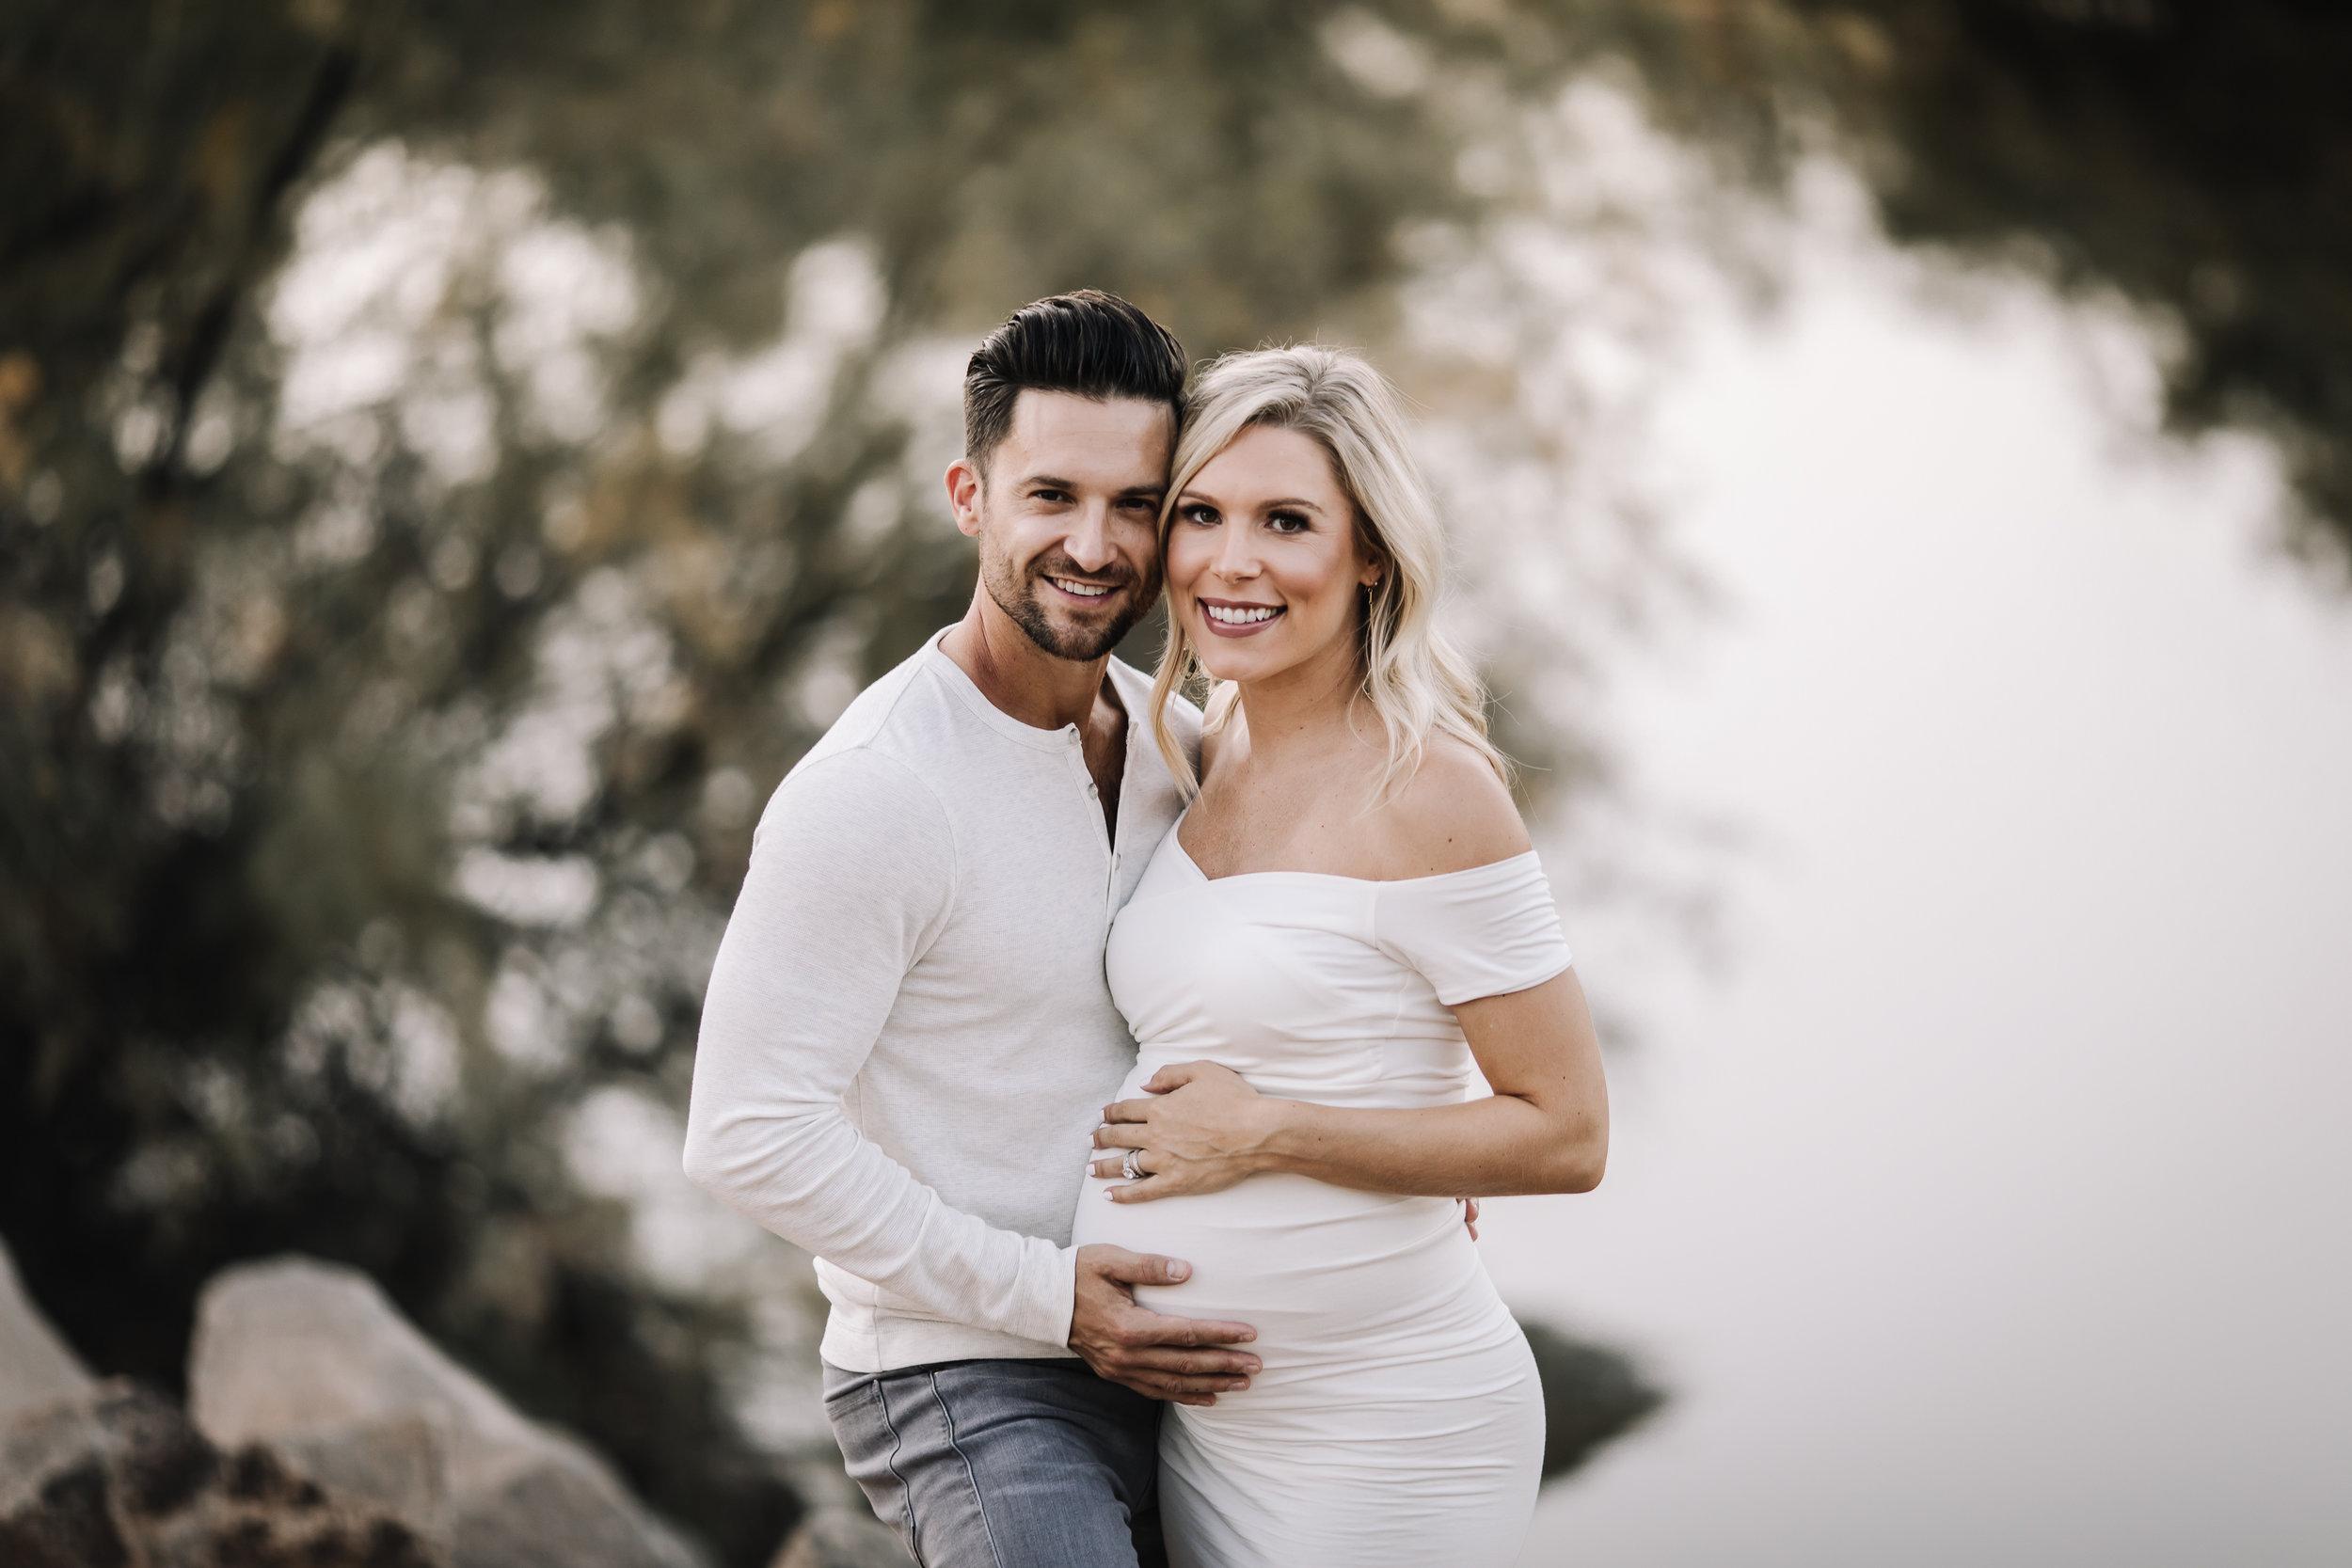 mintysnaps_maternitysession (4 of 16).jpg